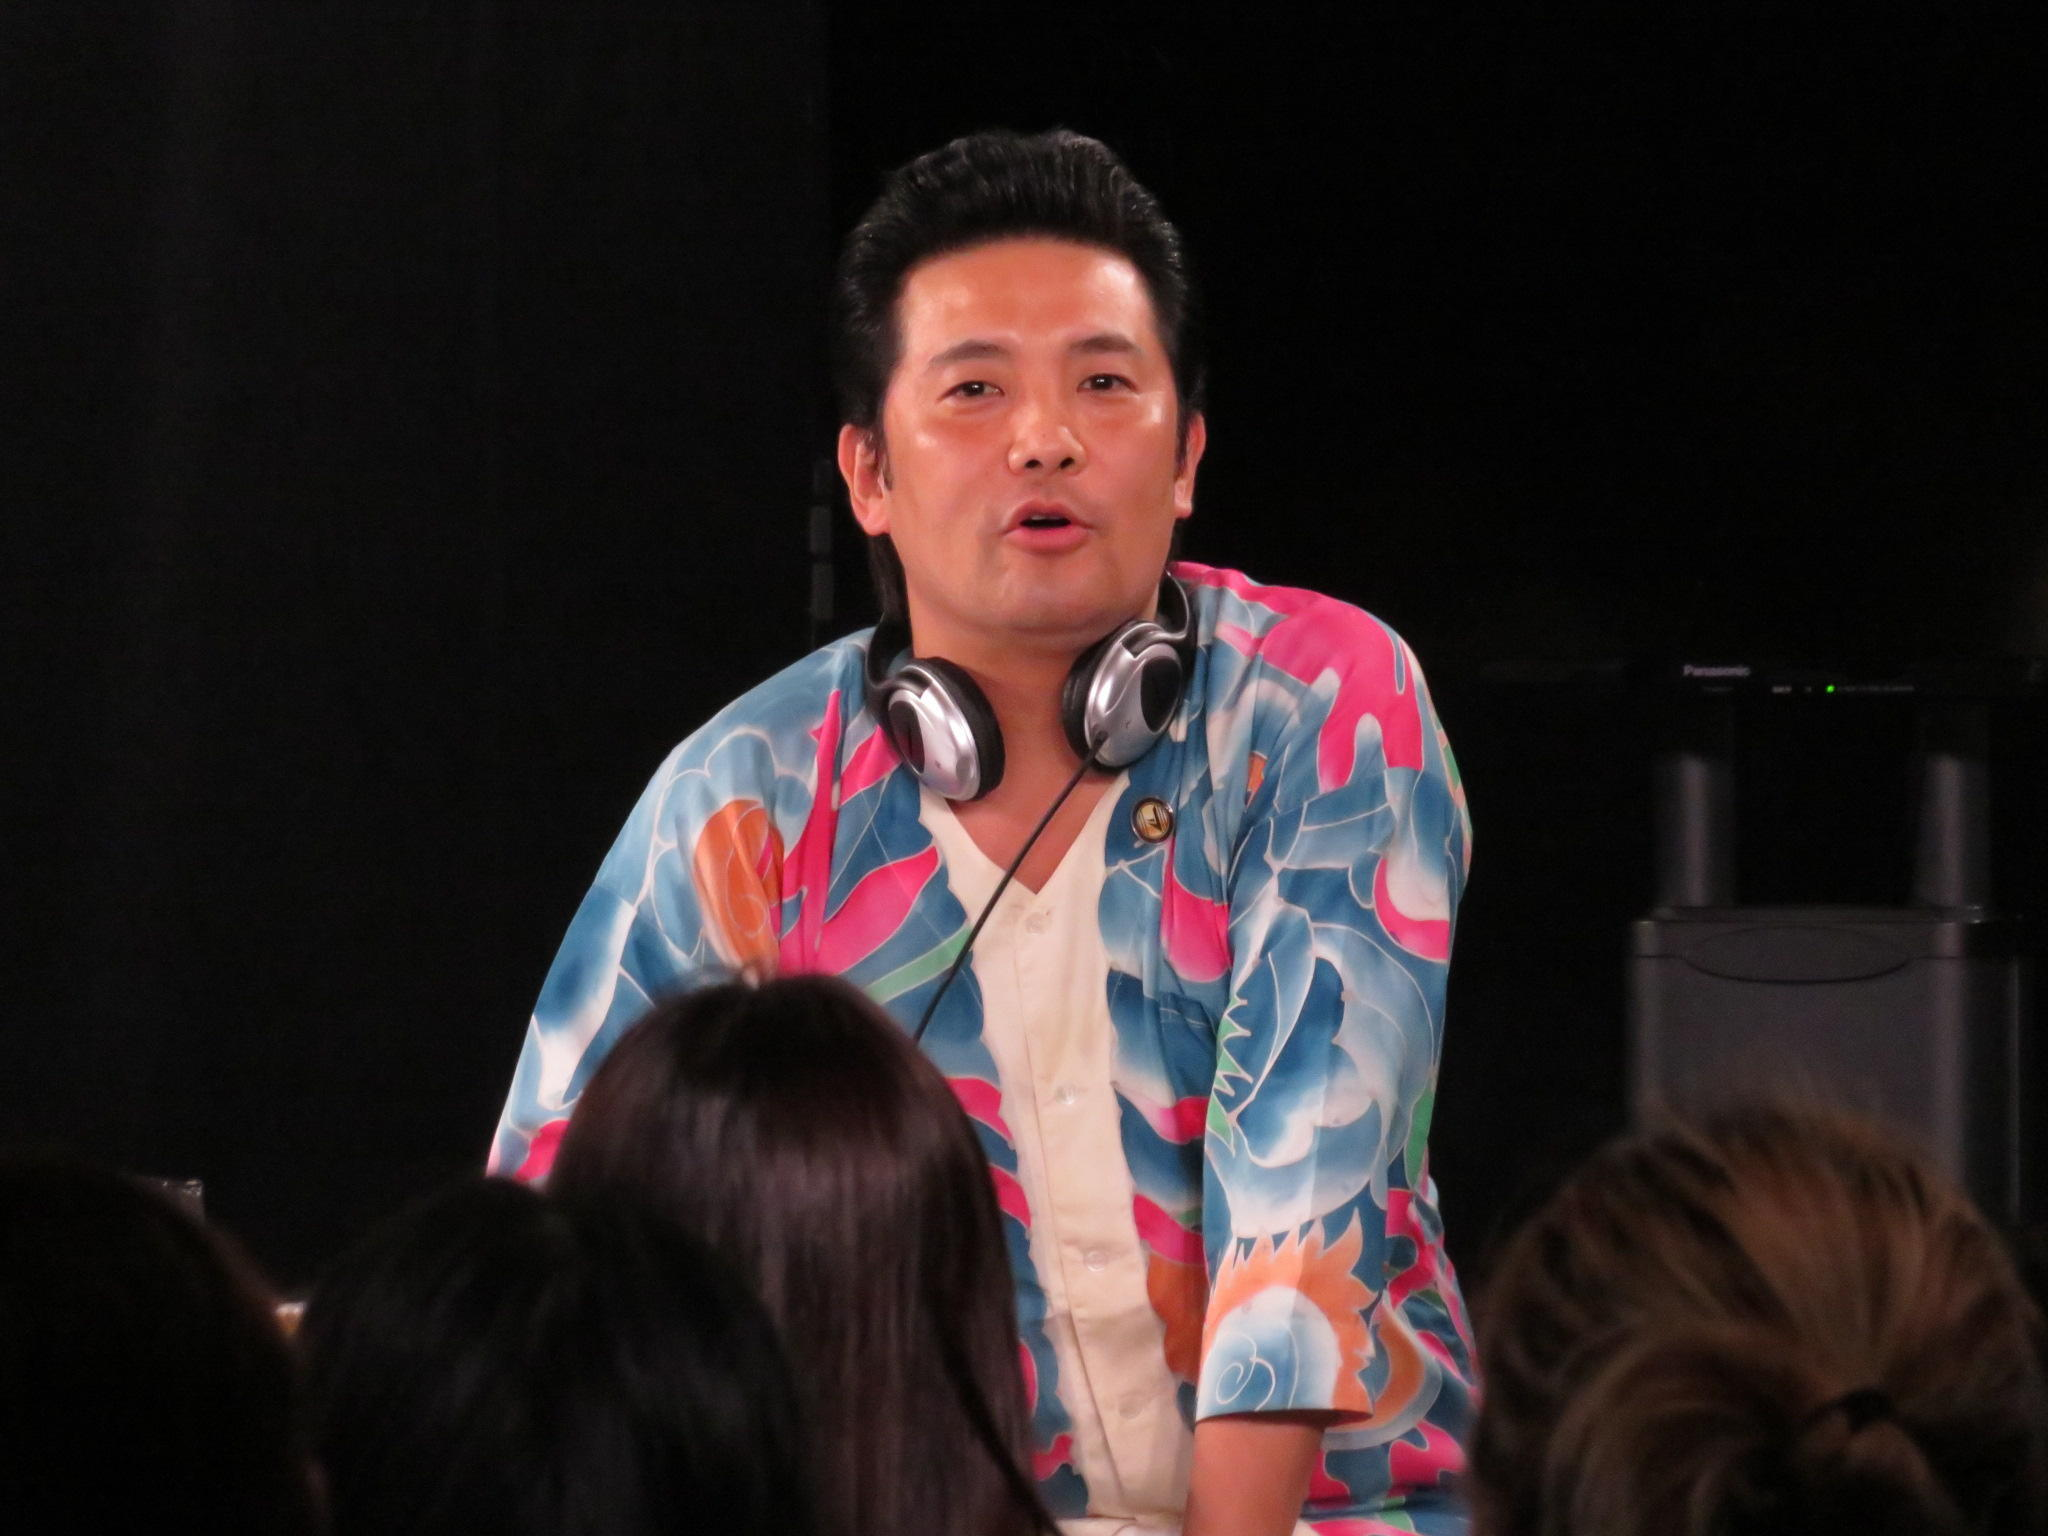 http://news.yoshimoto.co.jp/20180910205958-4ec4898f7408534f8ac36b48ed73c3e340173784.jpg